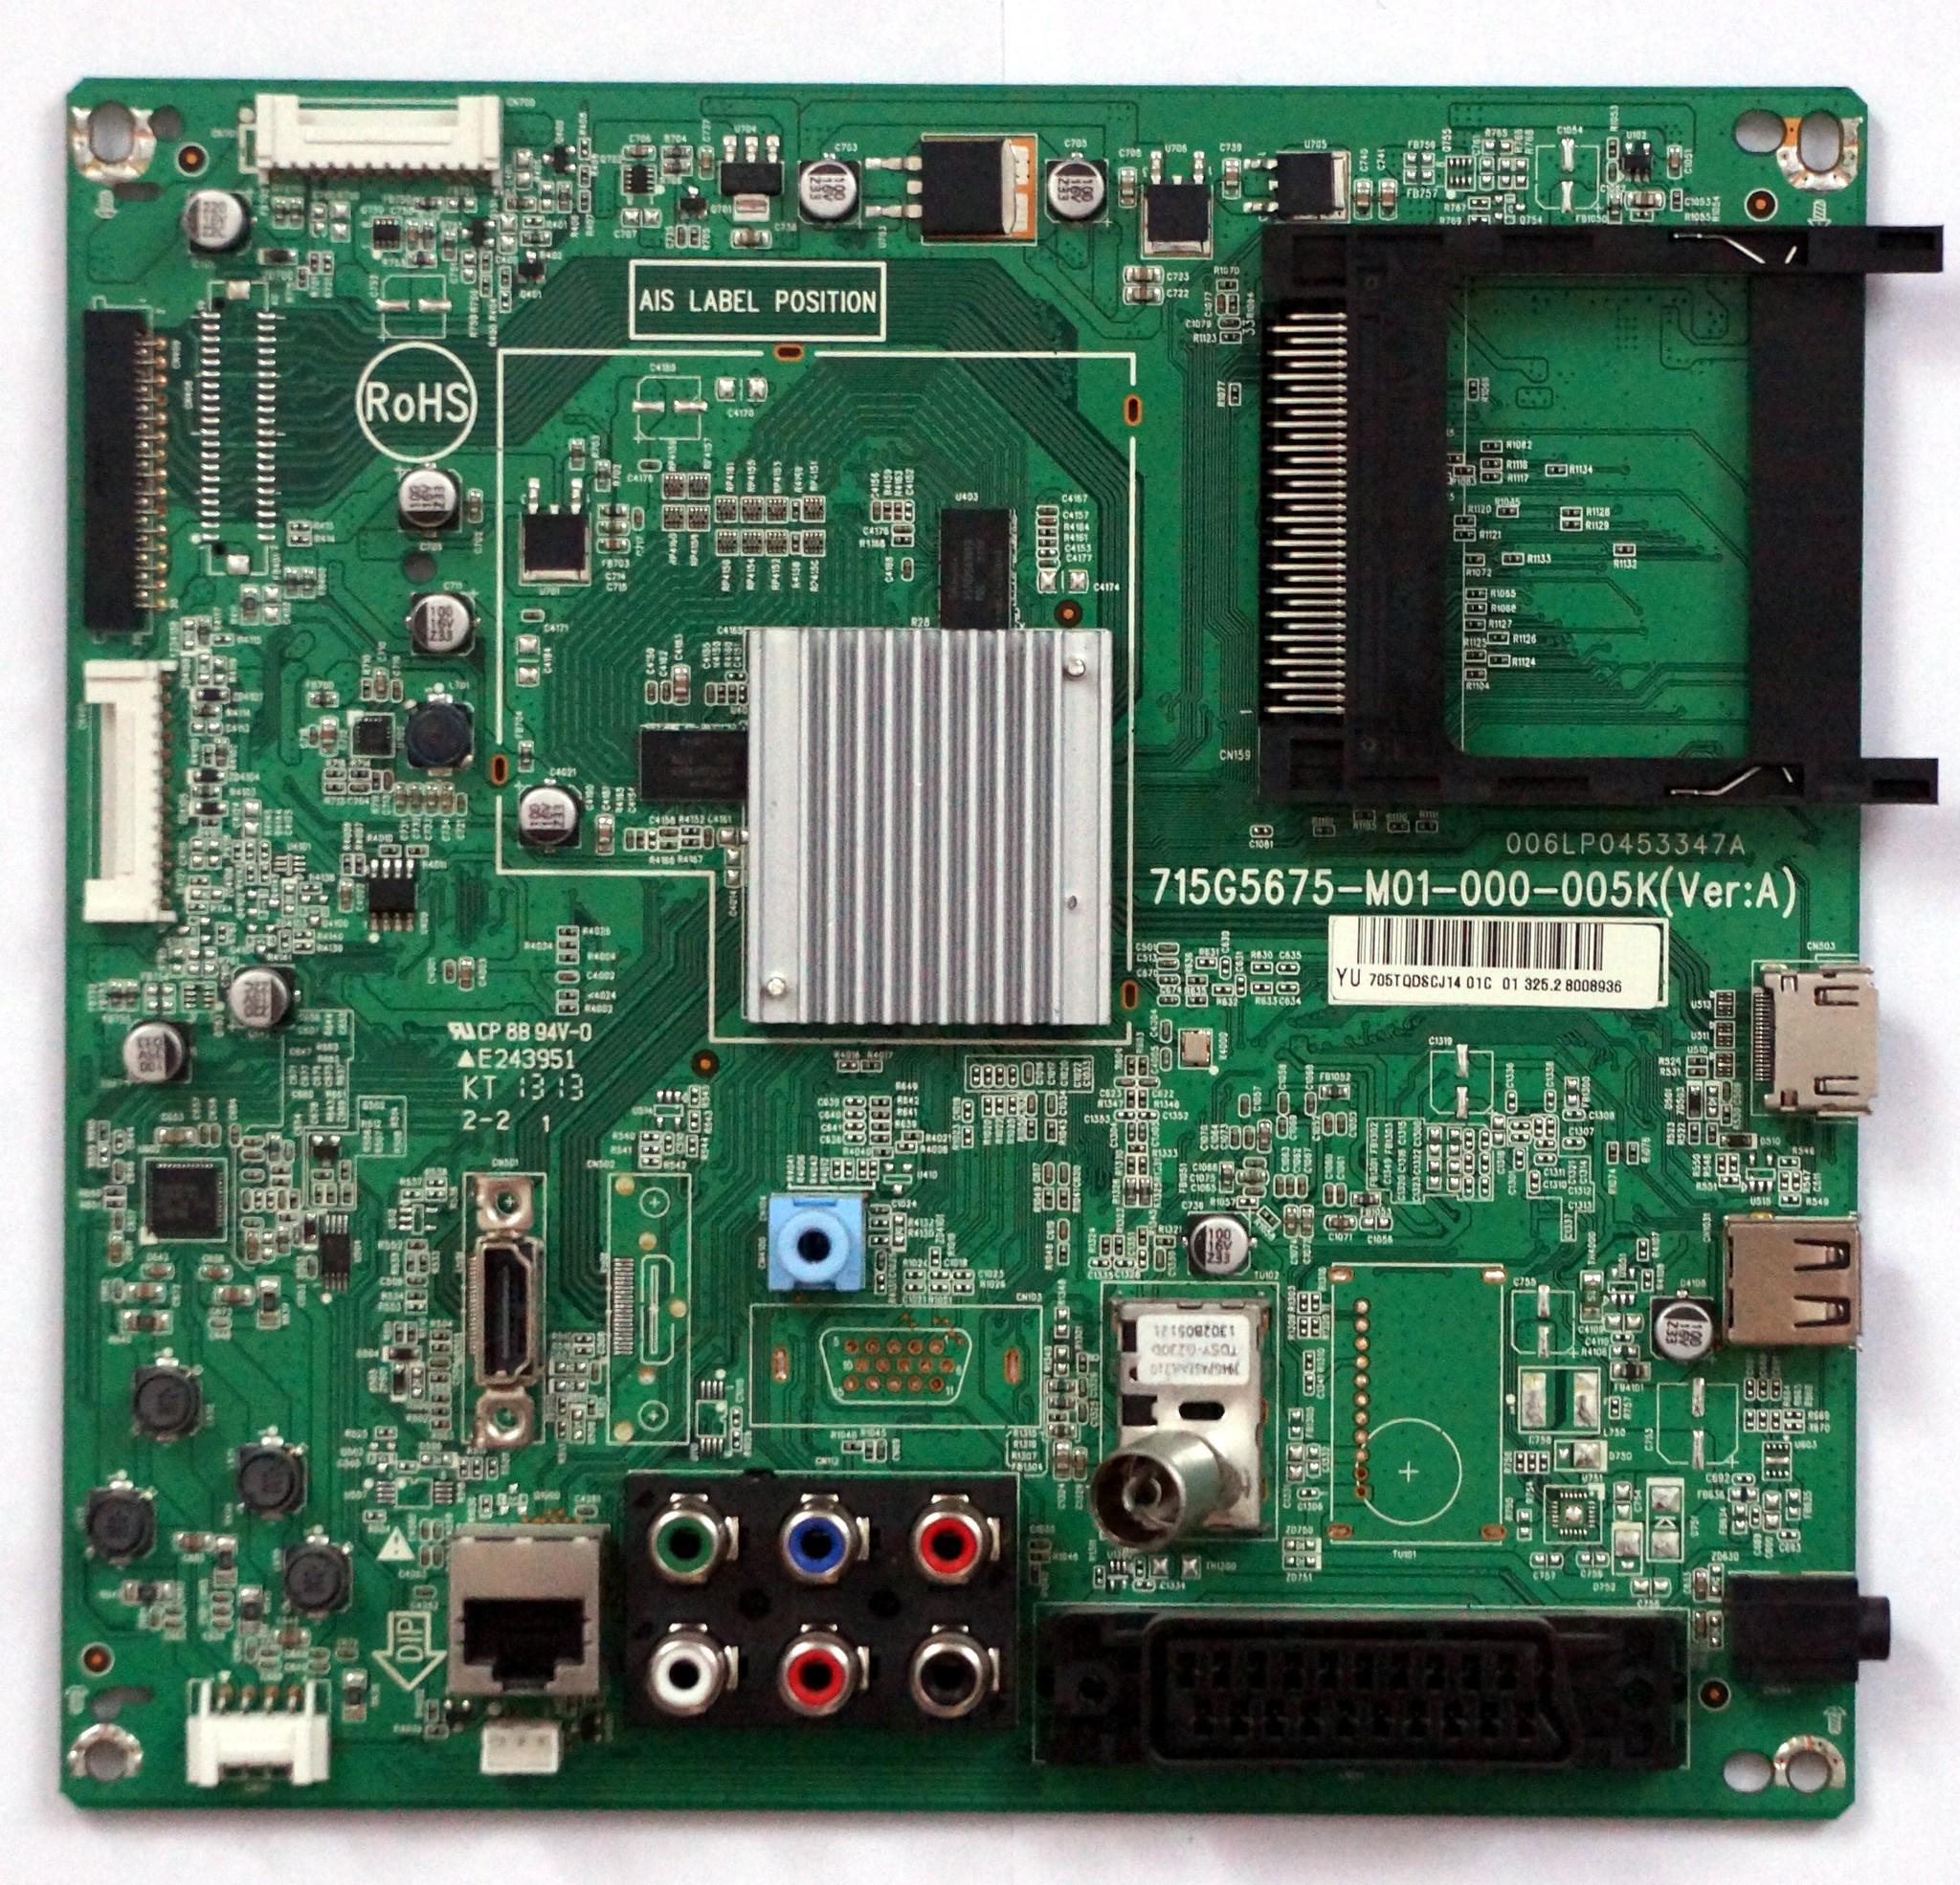 715G5675-M01-000-005K (ver:A) телевизора Philips